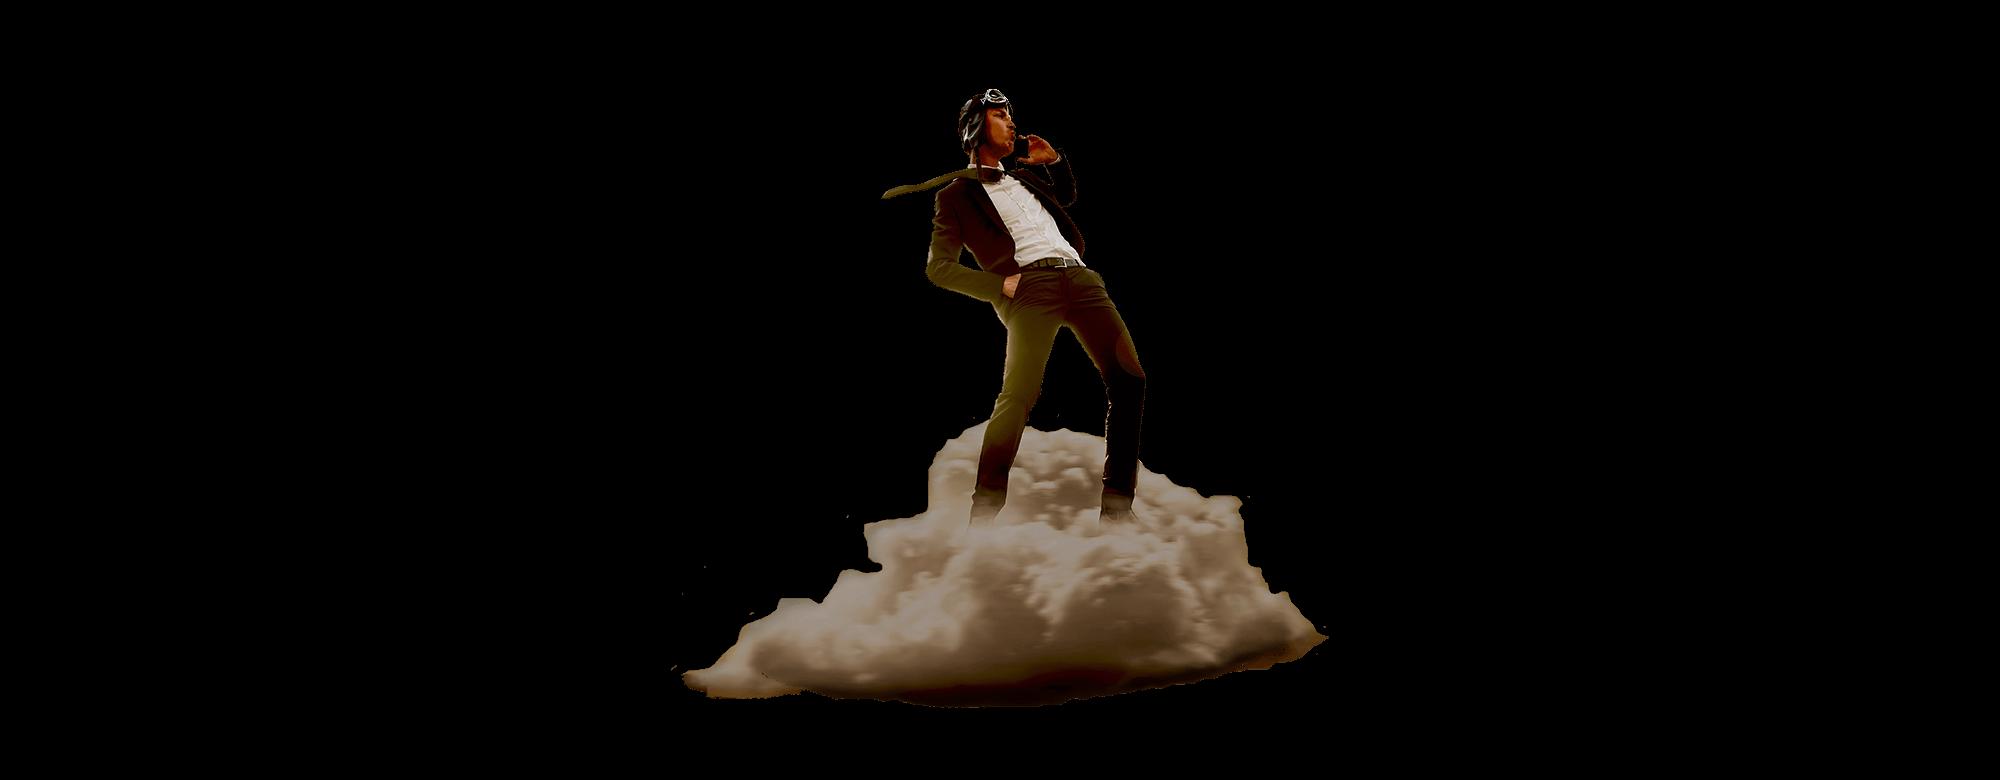 Cloudman-2.png